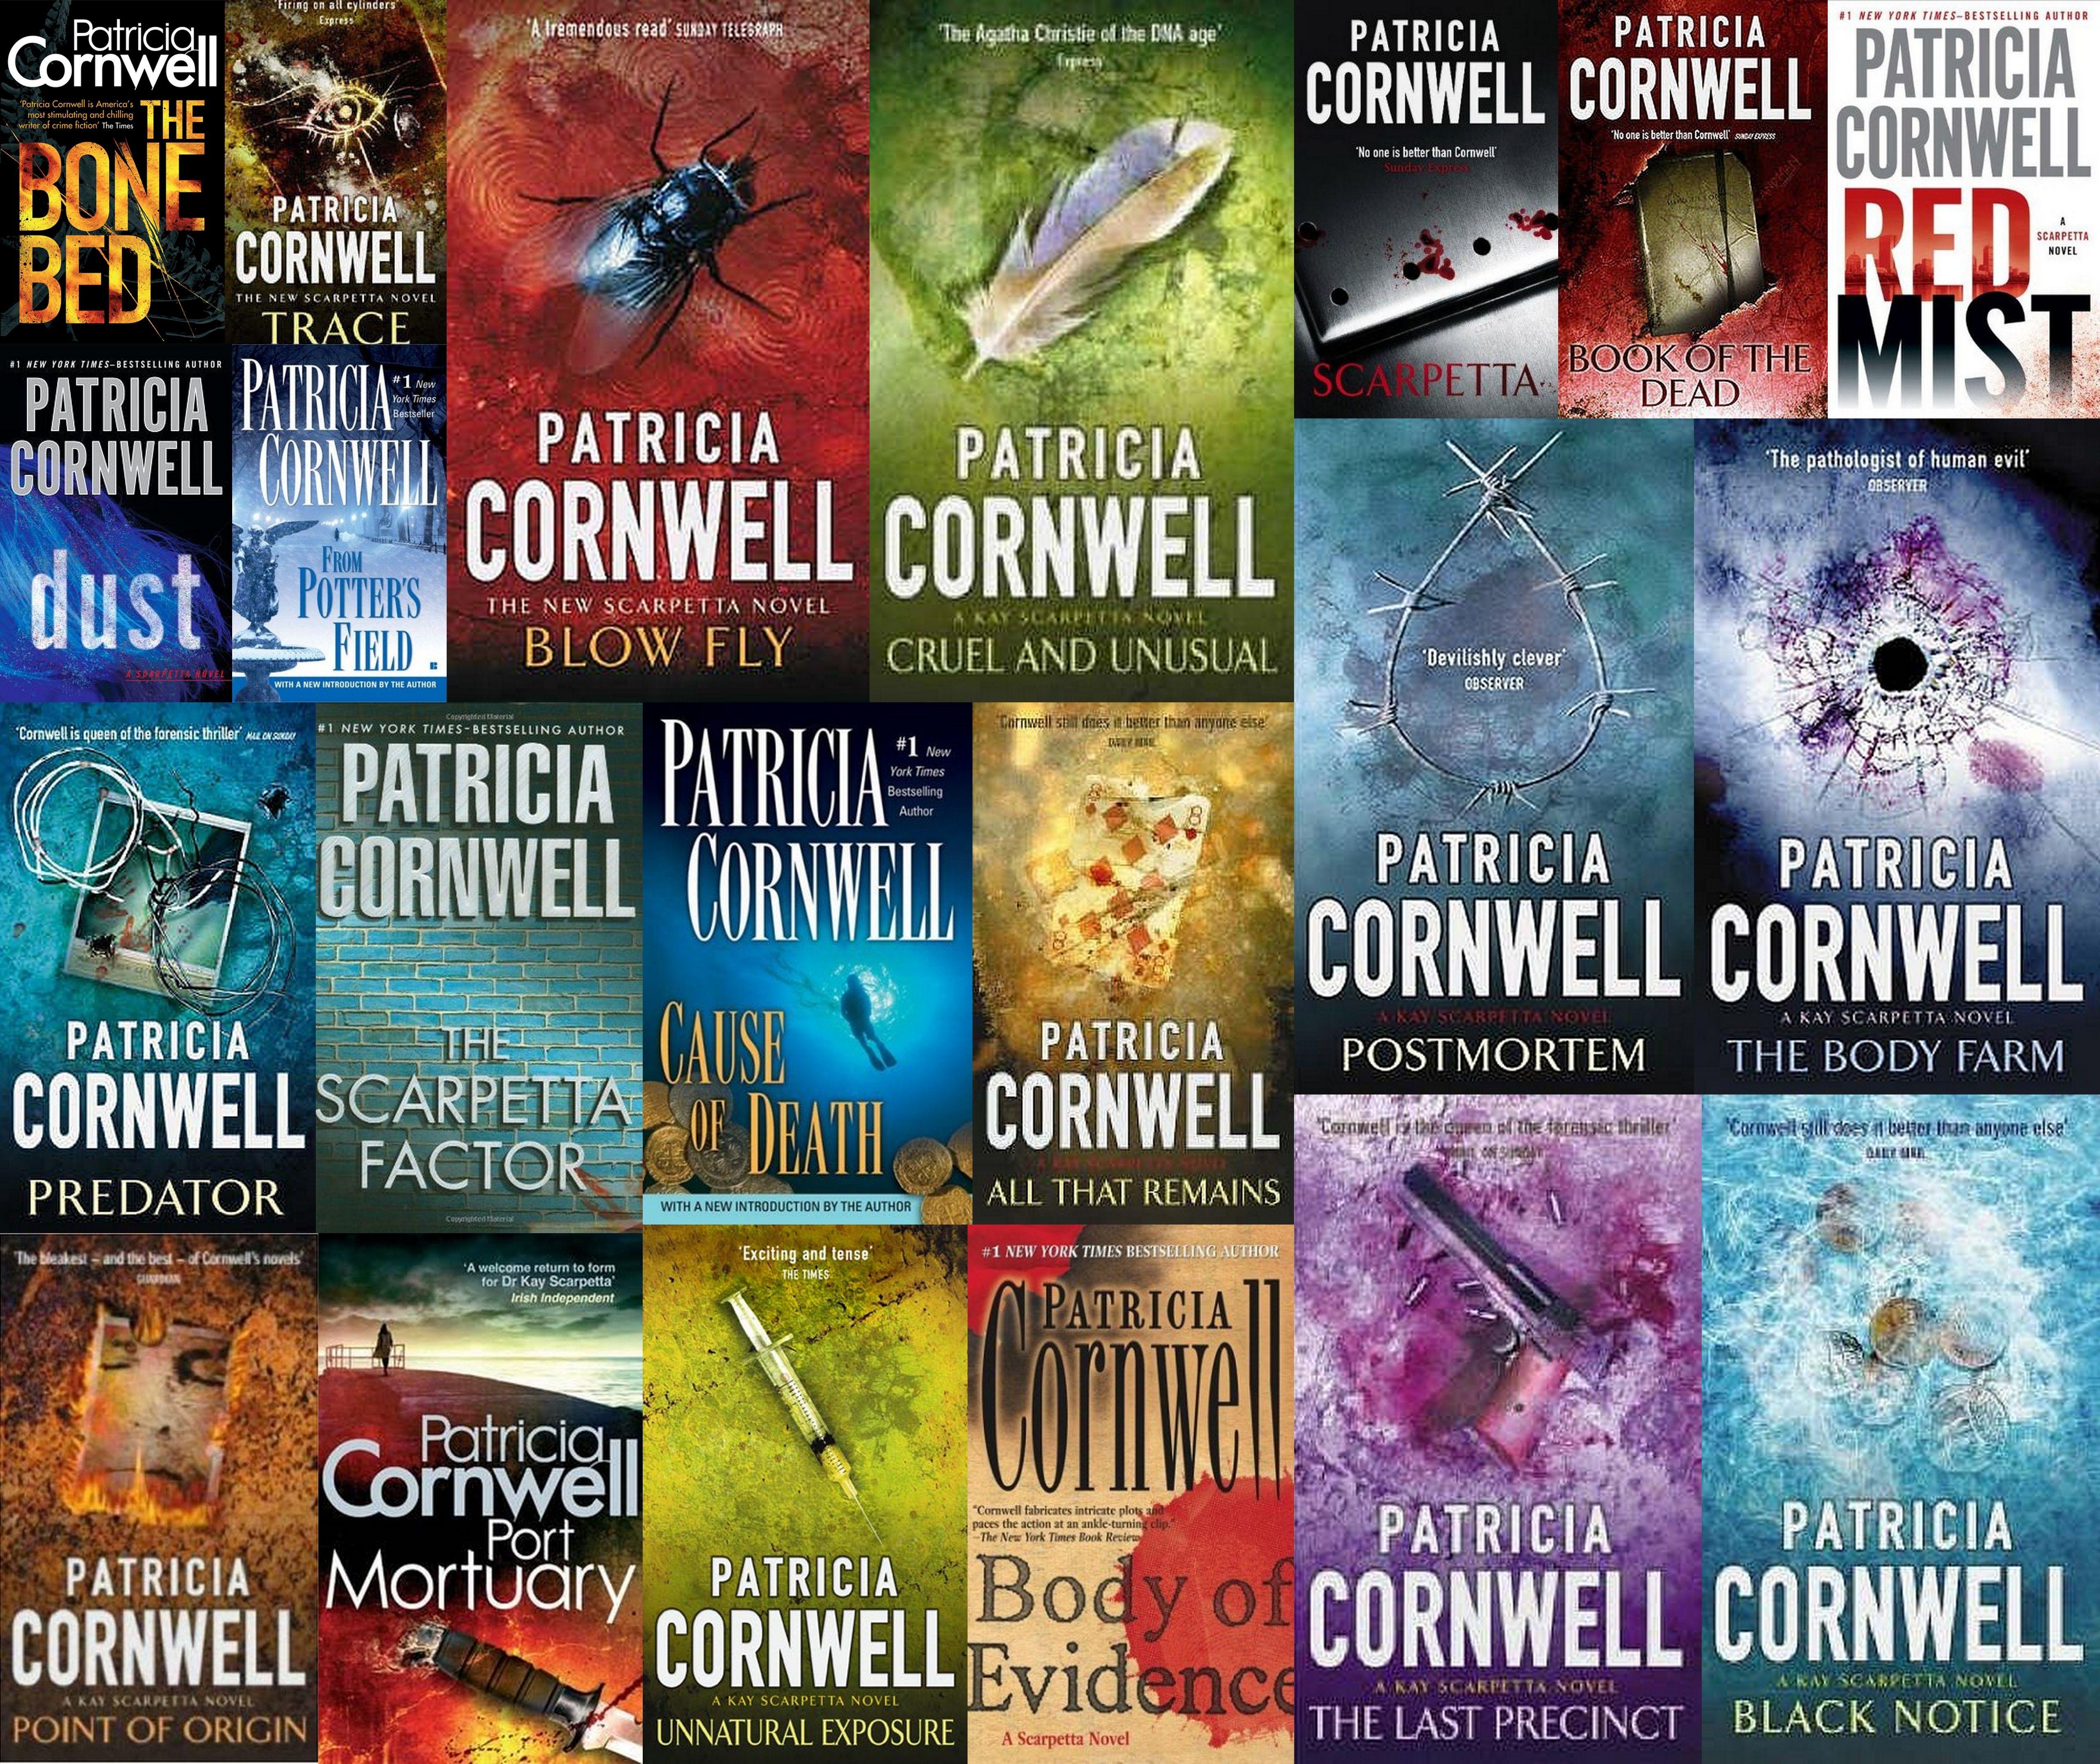 Patricia Cornwell's Kay Scarpetta Series Next Book (#22)